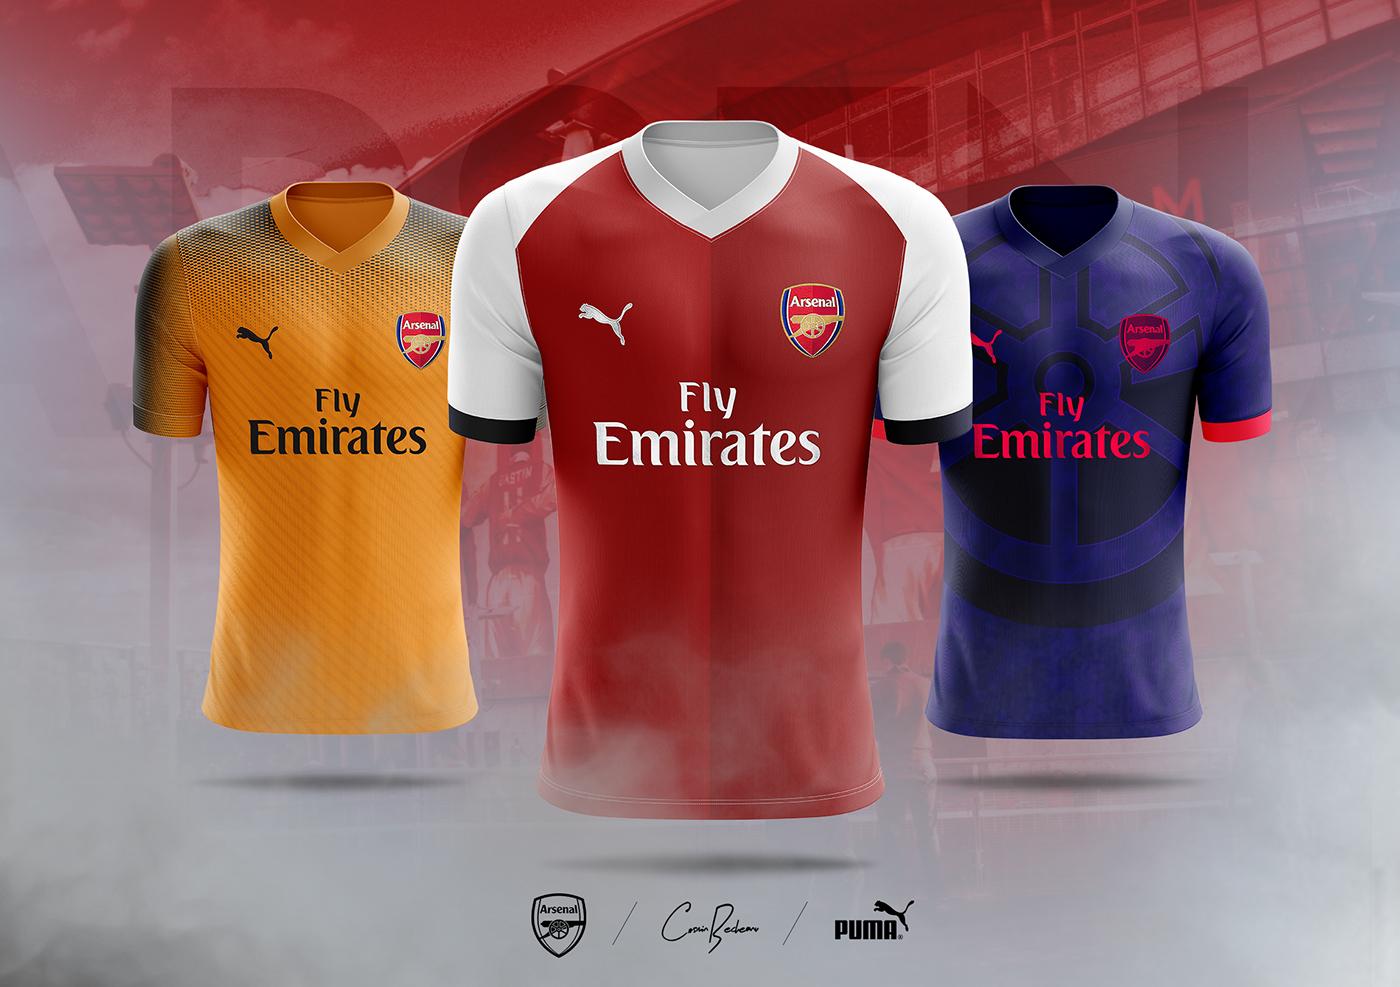 0bd97faba Arsenal FC - PUMA - Concept 2019 on Behance